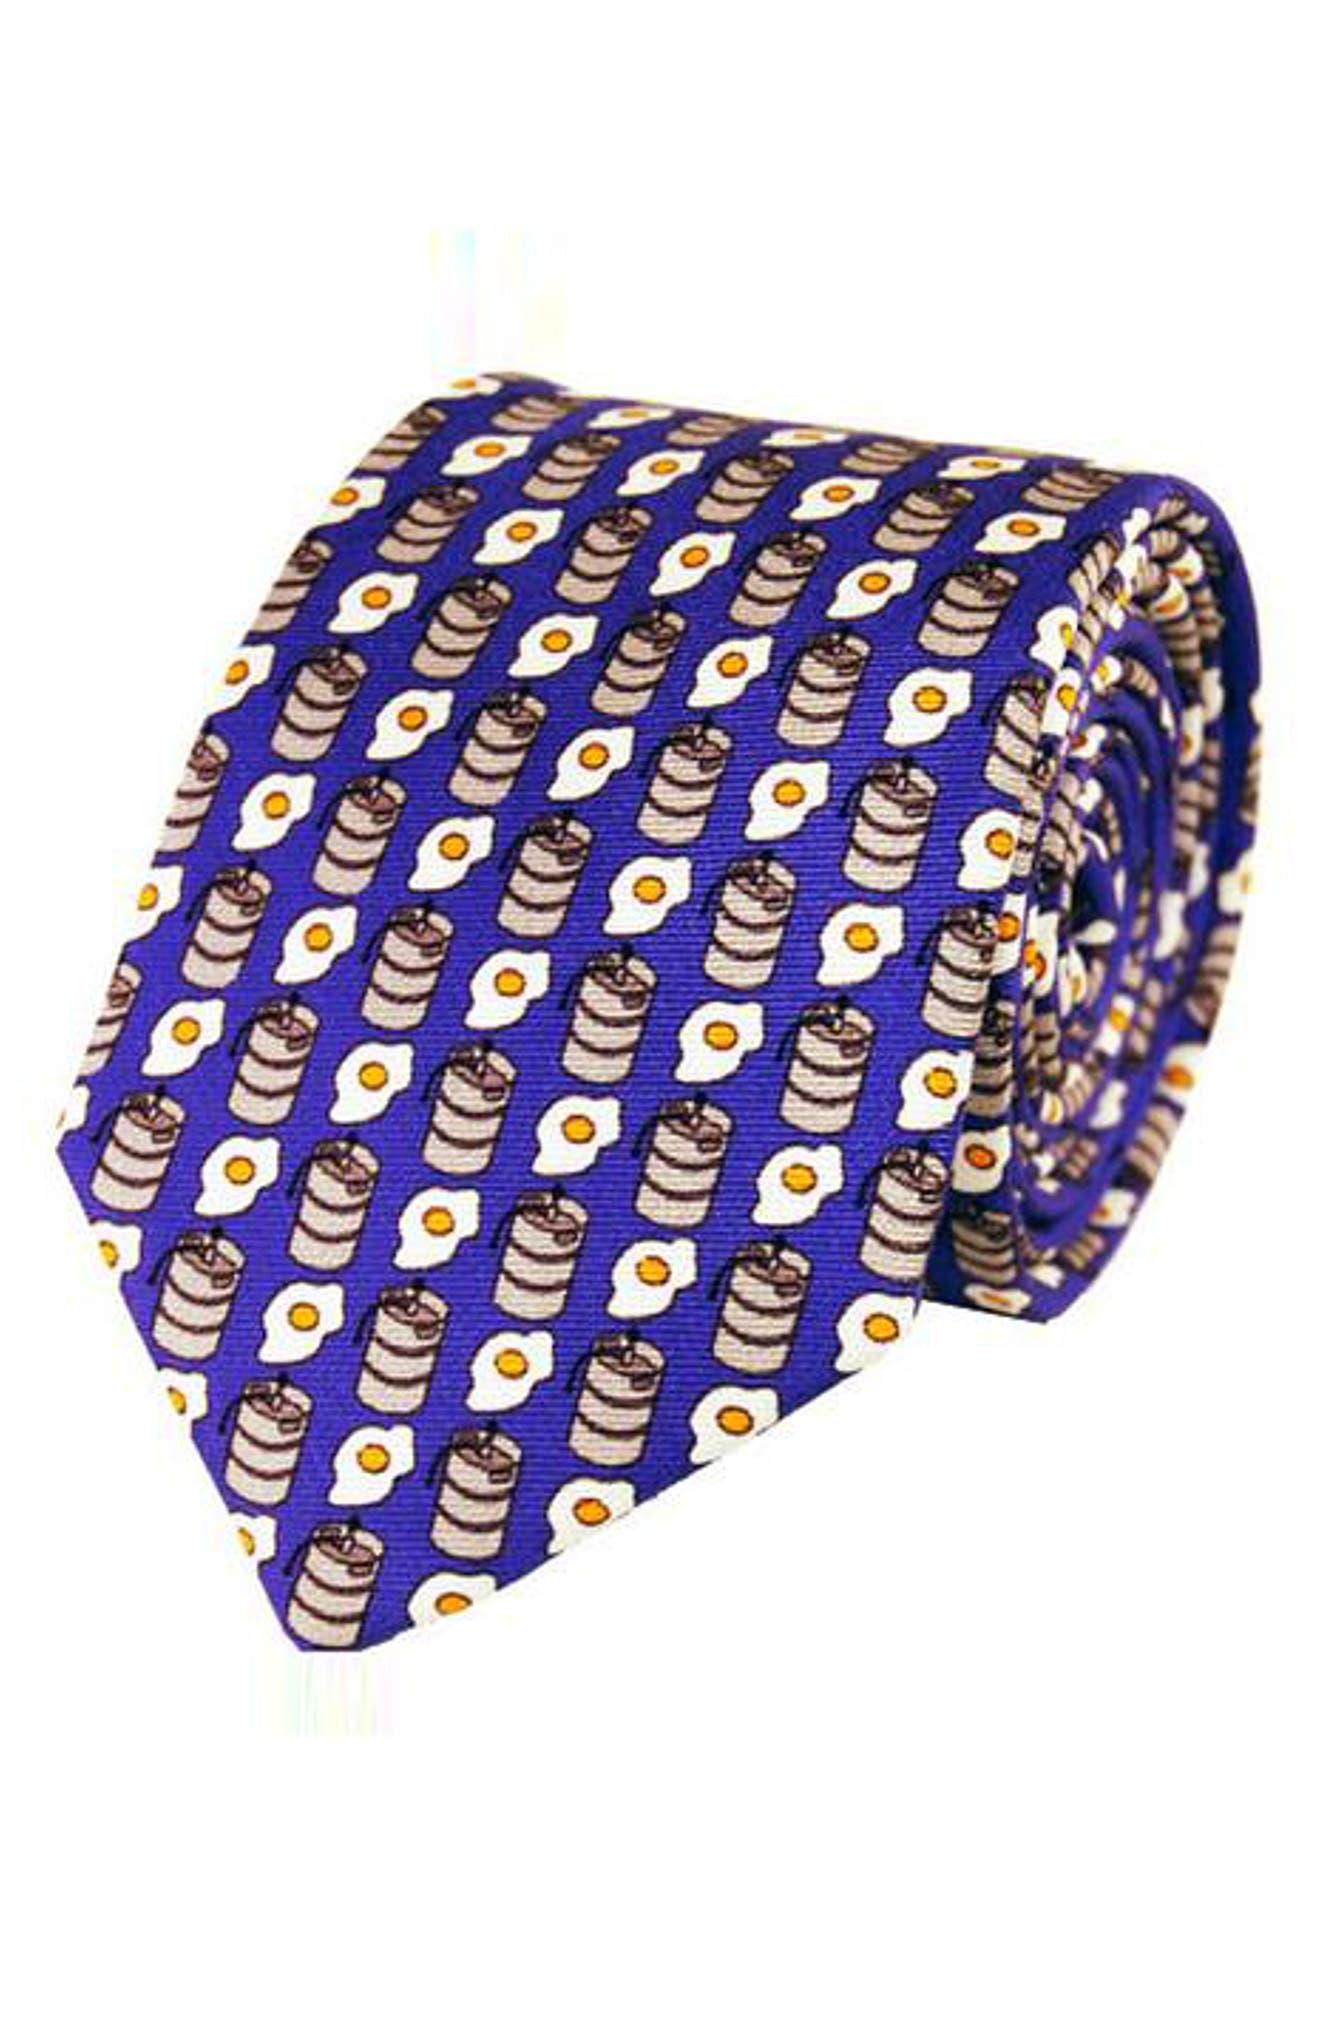 Kegs & Eggs Silk Tie,                             Main thumbnail 1, color,                             Blue